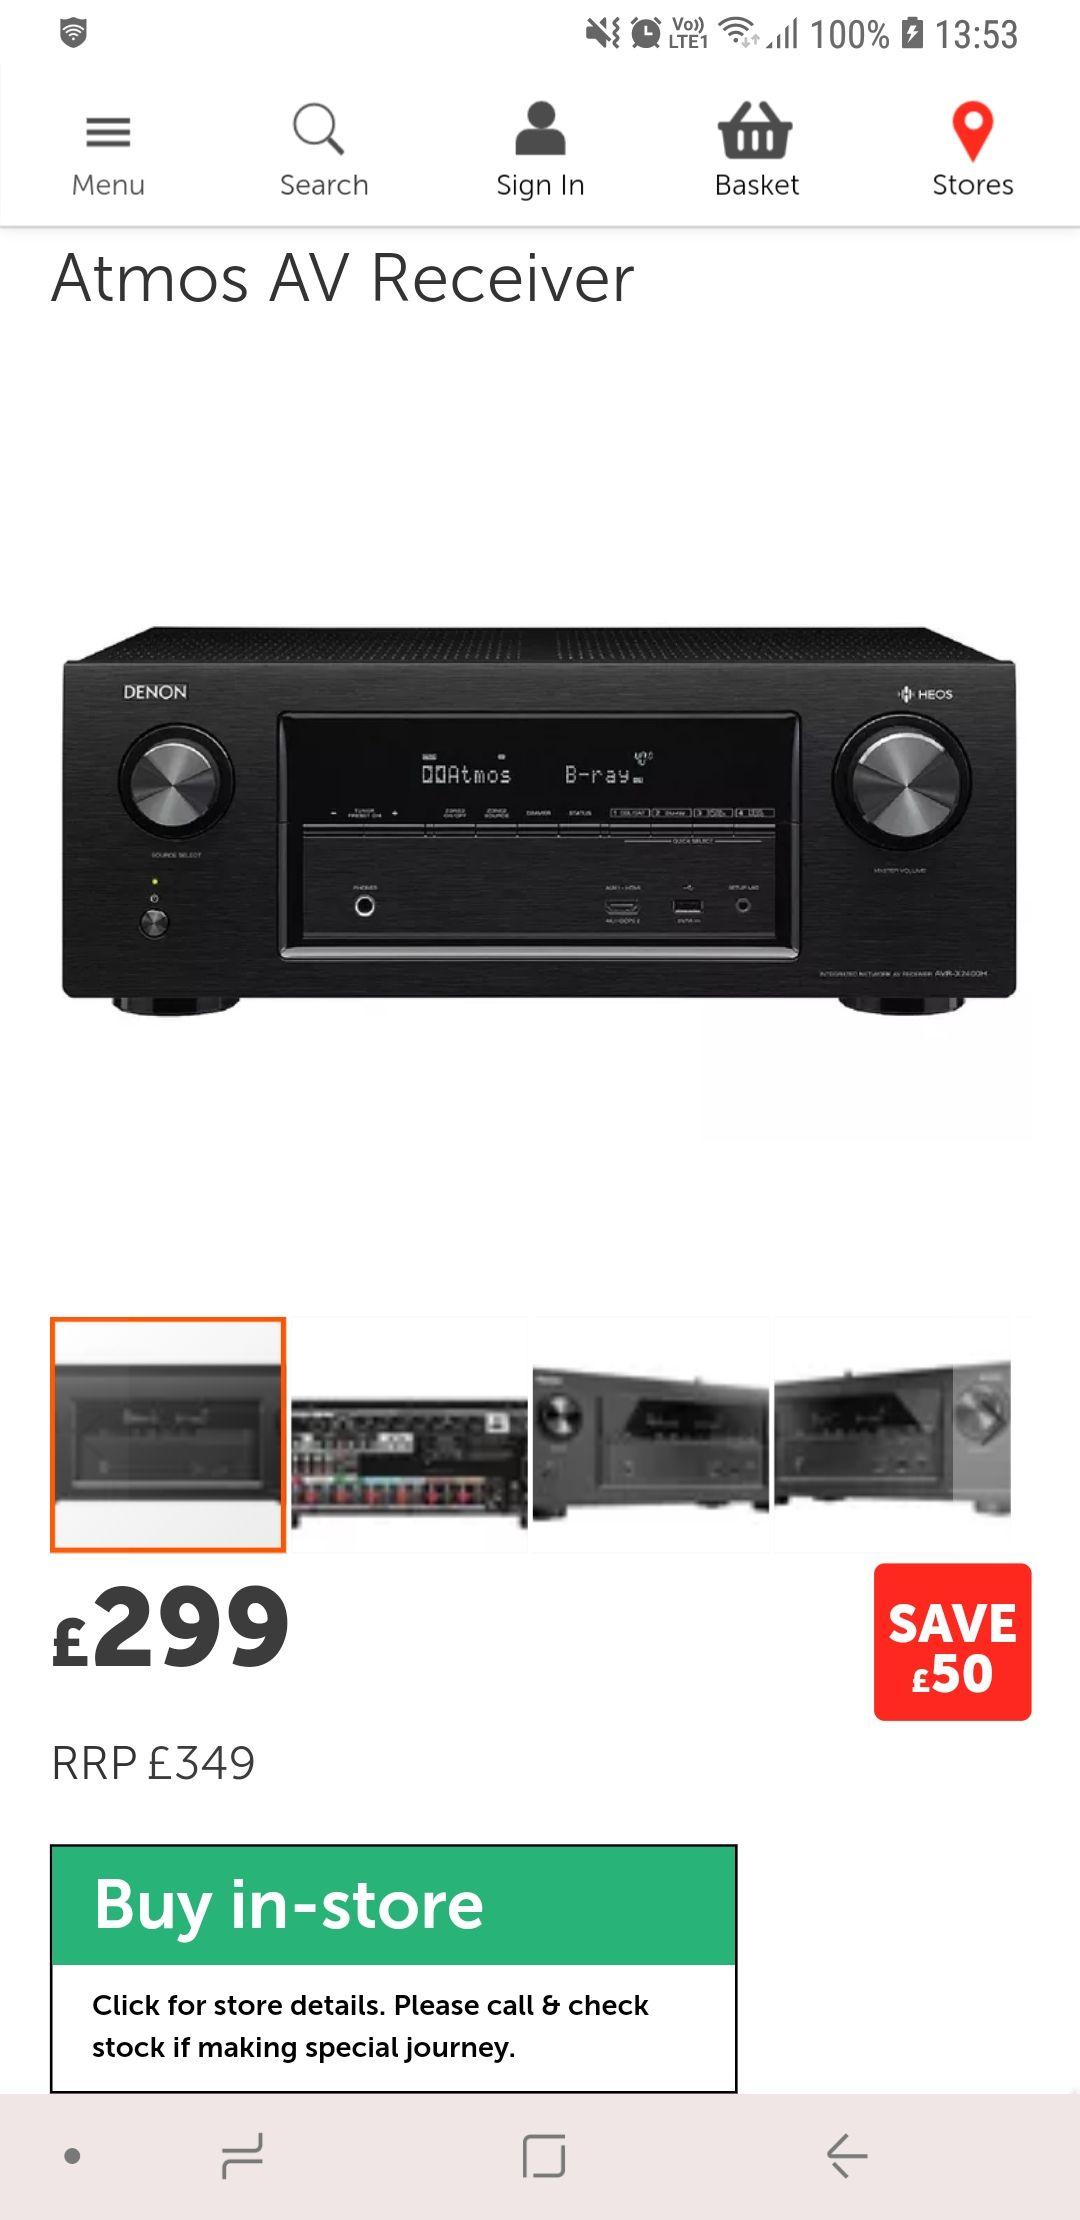 Denon AVRX2400(Black)Atmos AV Receiver £299  Richer Sounds